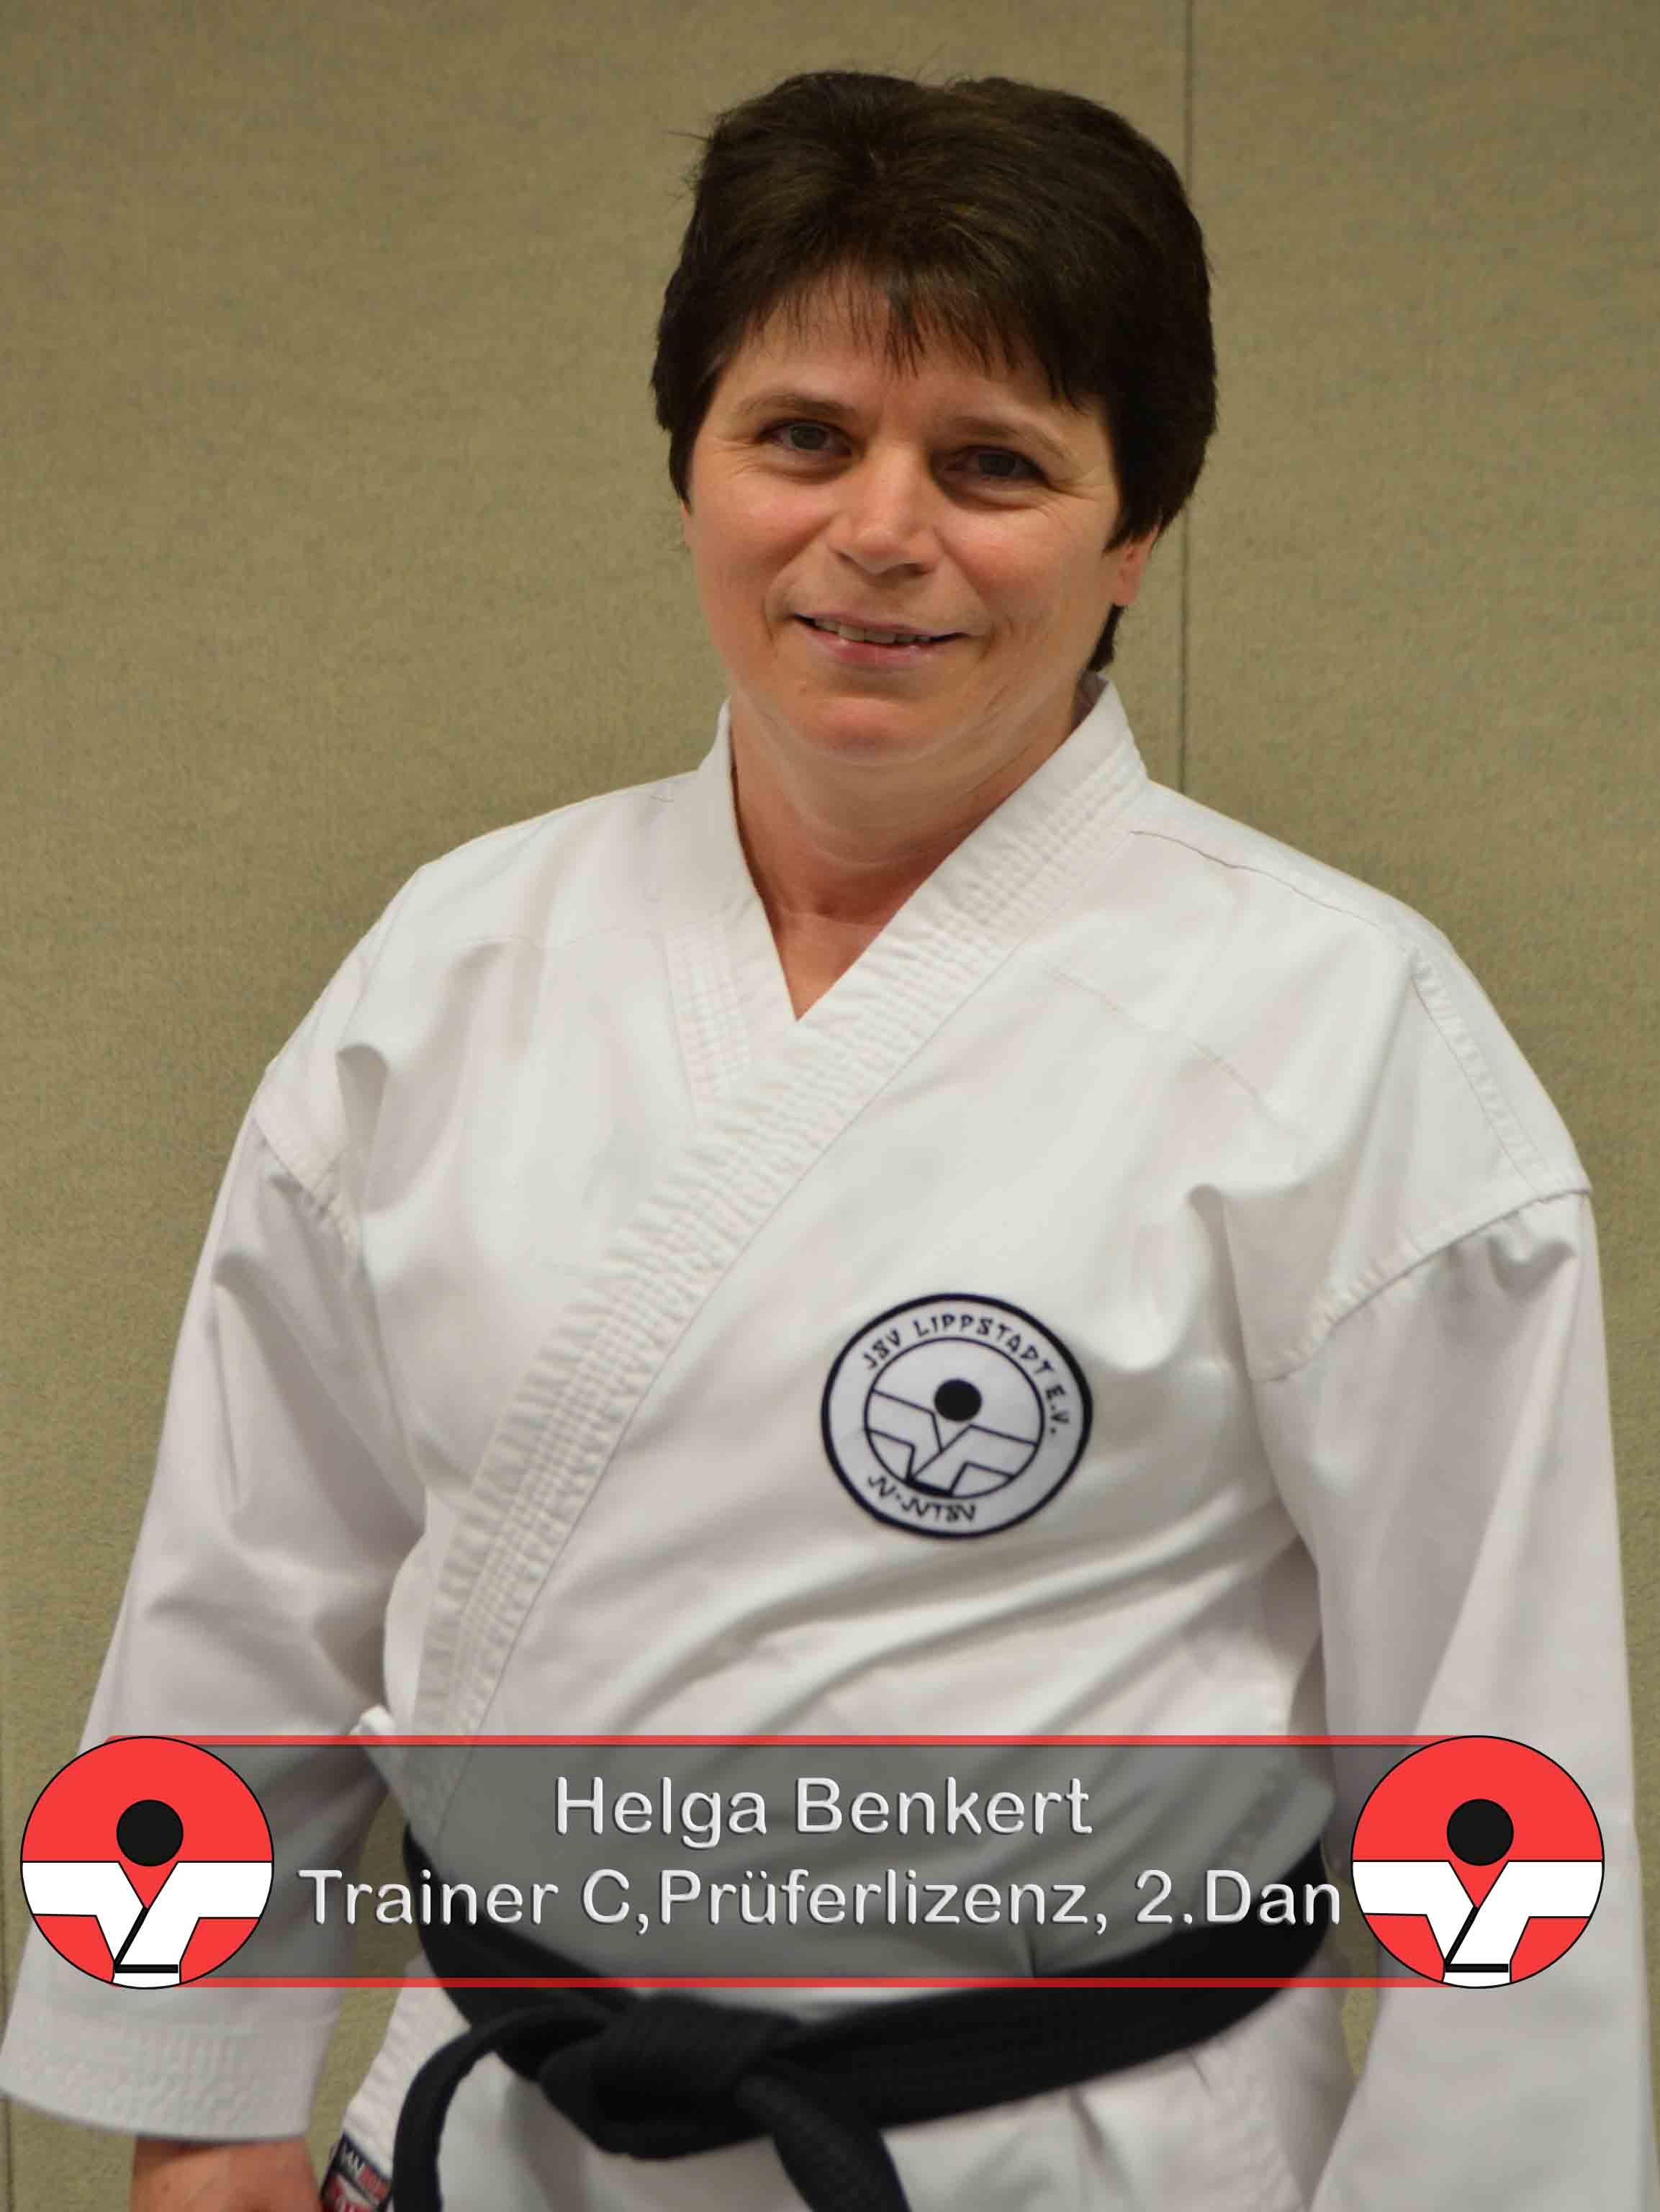 Helga Benkert